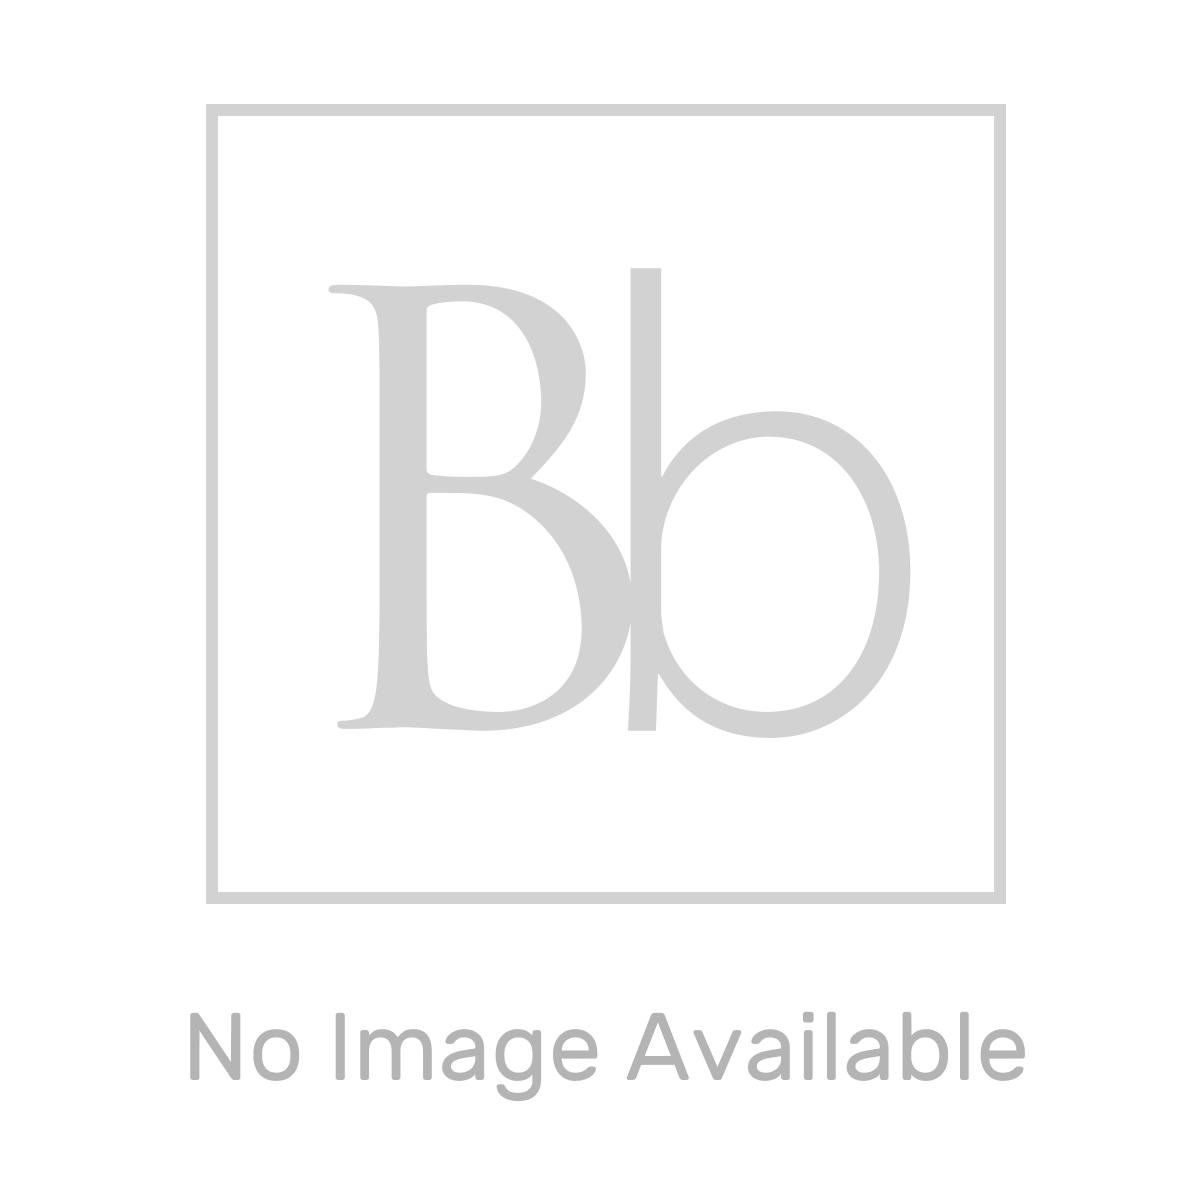 Niko L Shaped Right Hand Shower Bath 1700 x 700mm